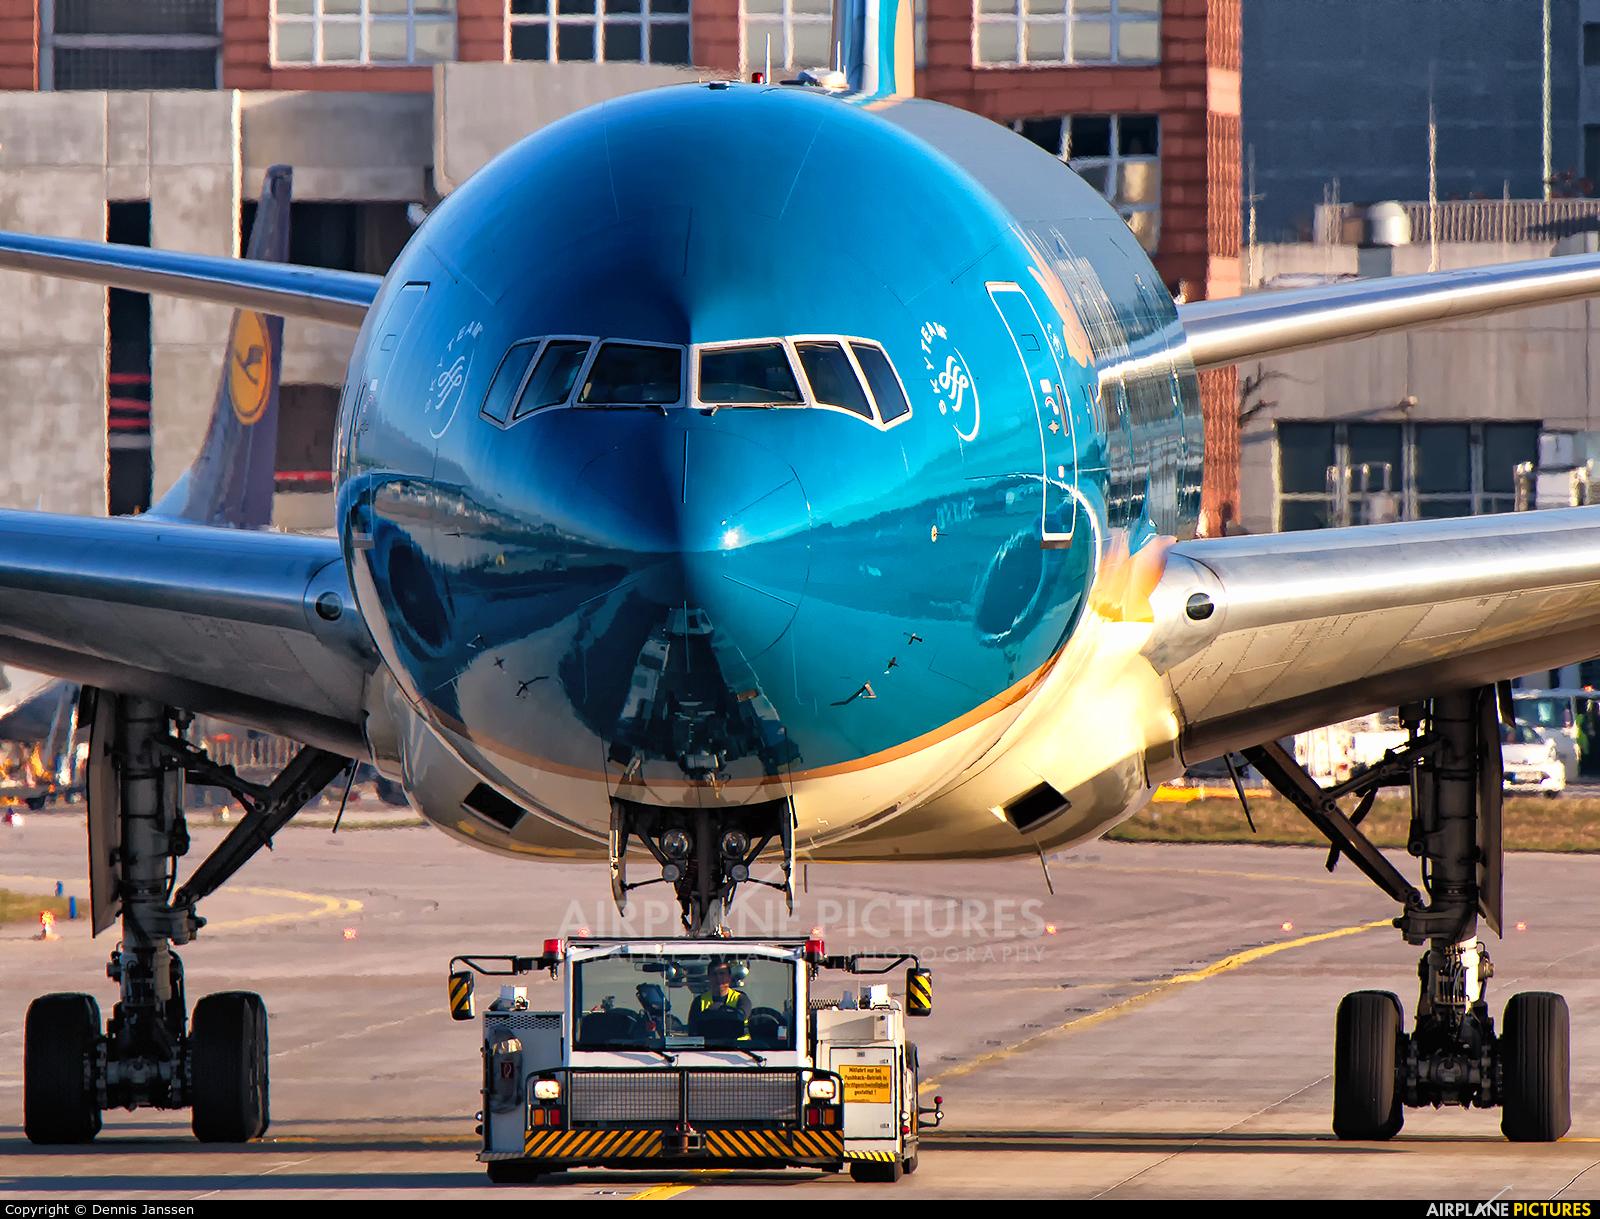 Vietnam Airlines VN-A146 aircraft at Frankfurt